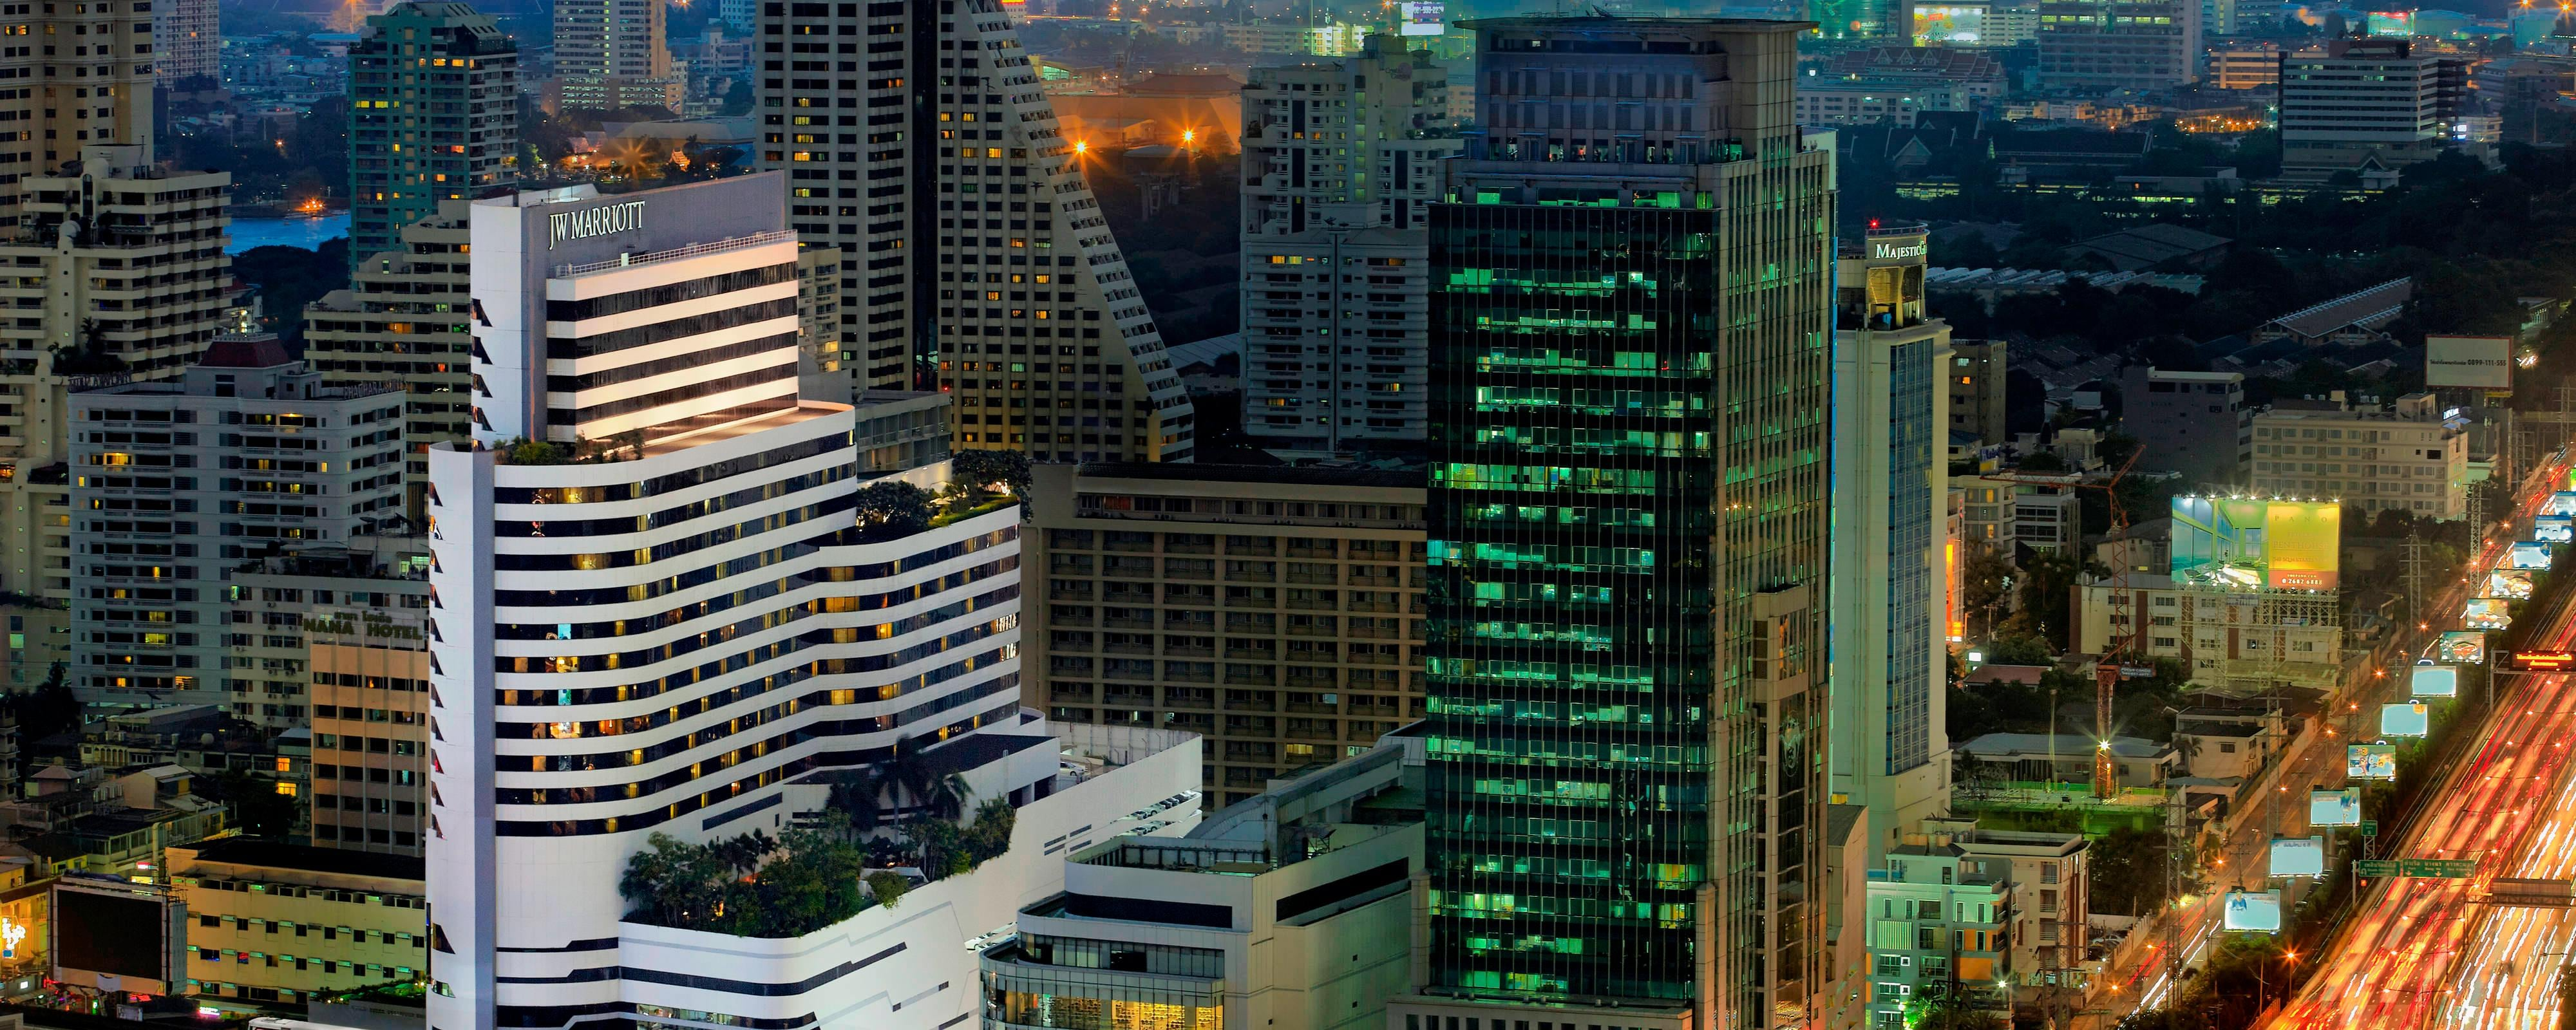 Luxury Hotel on Sukhumvit Road in Downtown Bangkok   JW Marriott Hotel Bangkok